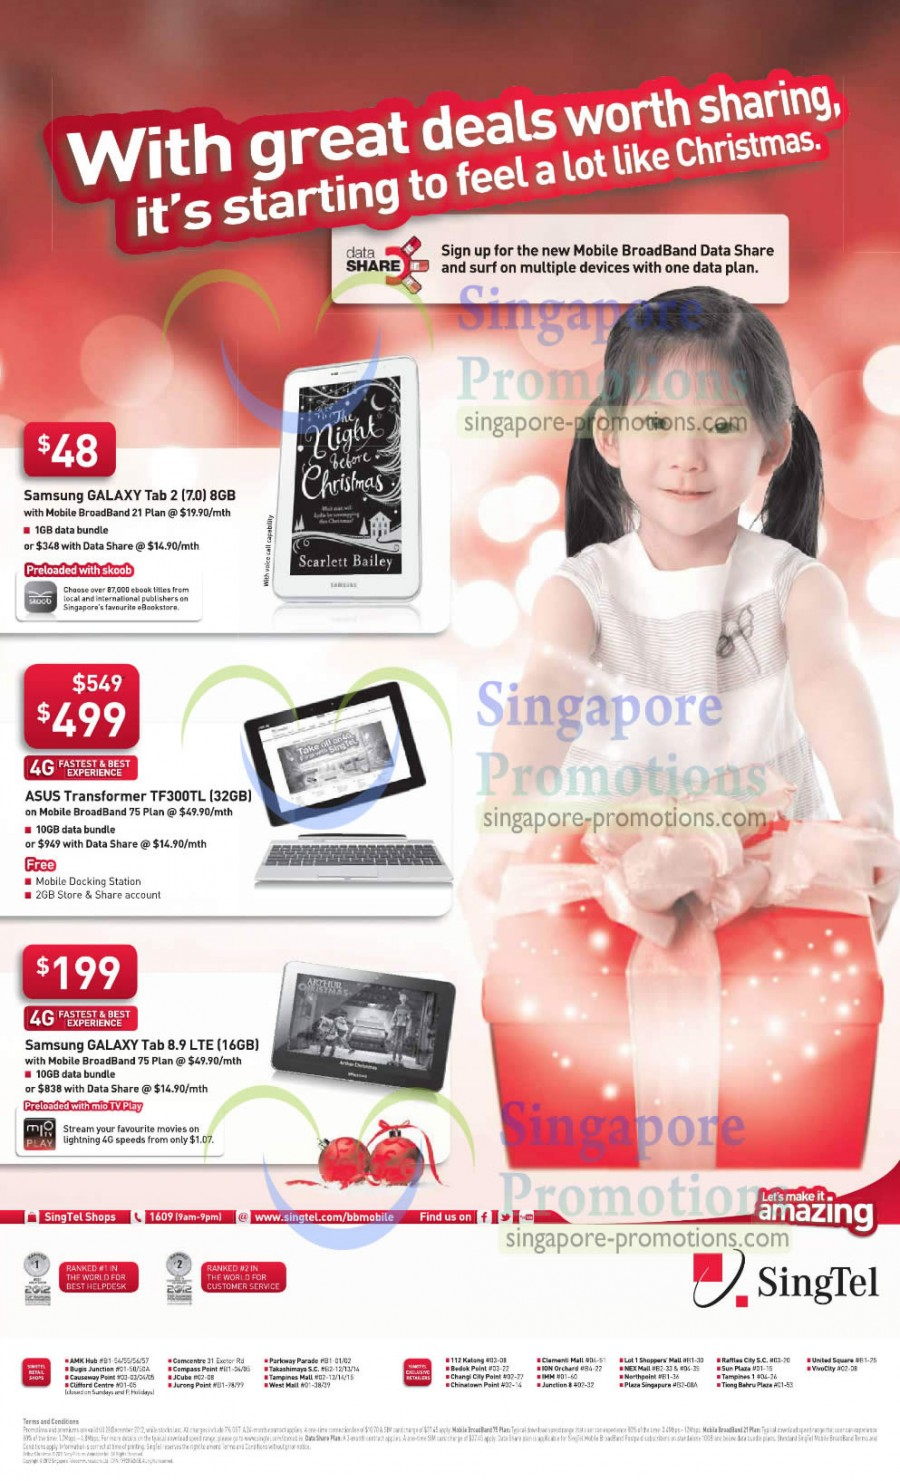 Samsung Galaxy Tab 2 7.0, ASUS Transformer TF300TL, Samsung Galaxy Tab 8.9 LTE